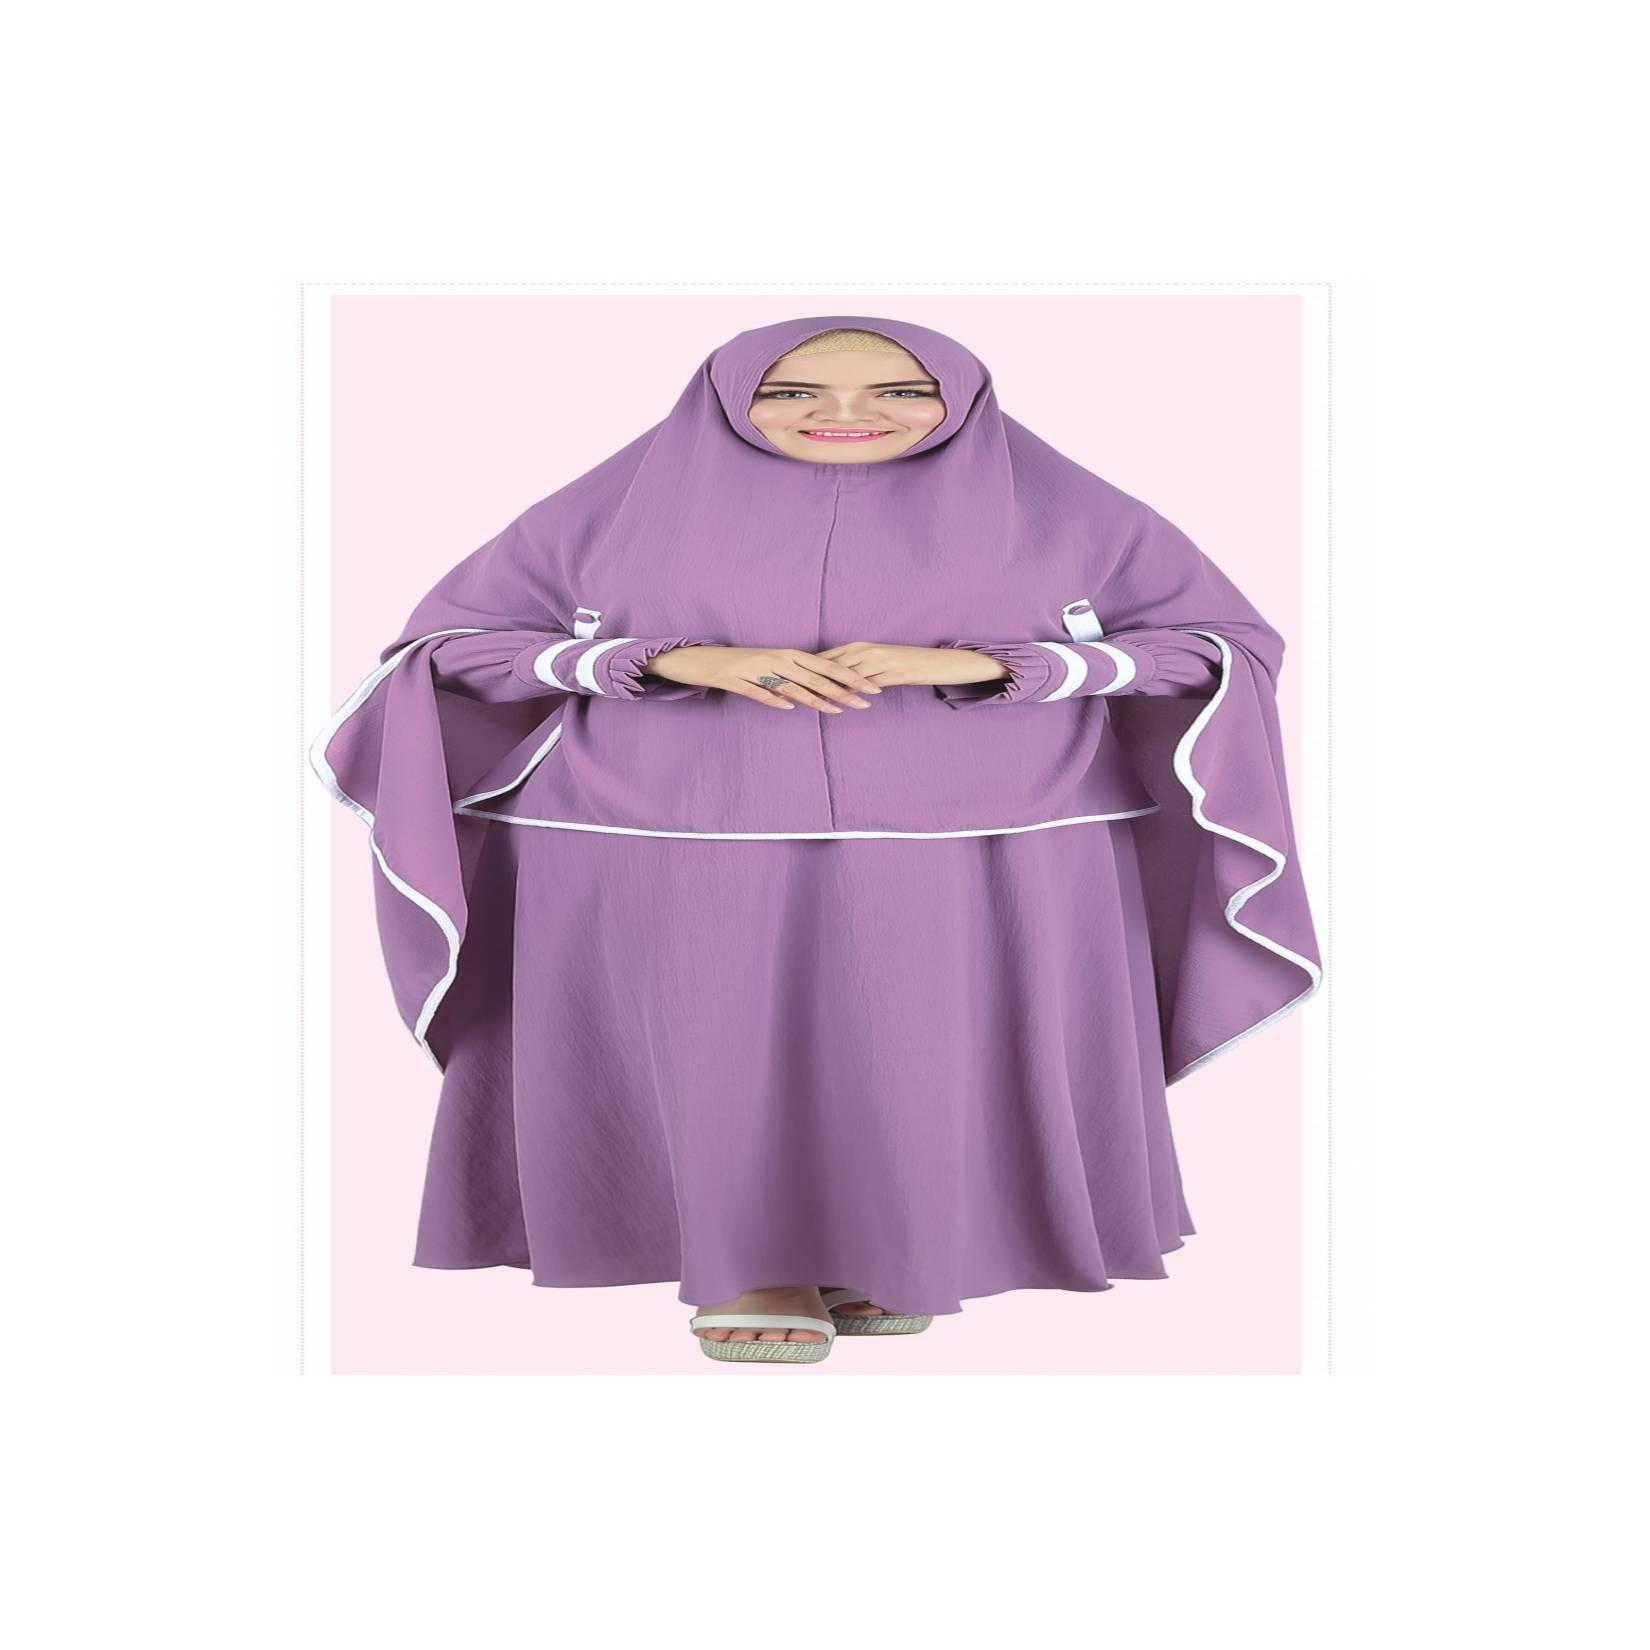 Baju Muslim Koko Pakistan Gamis Dress Setelan Wanita Pria Anak ungu